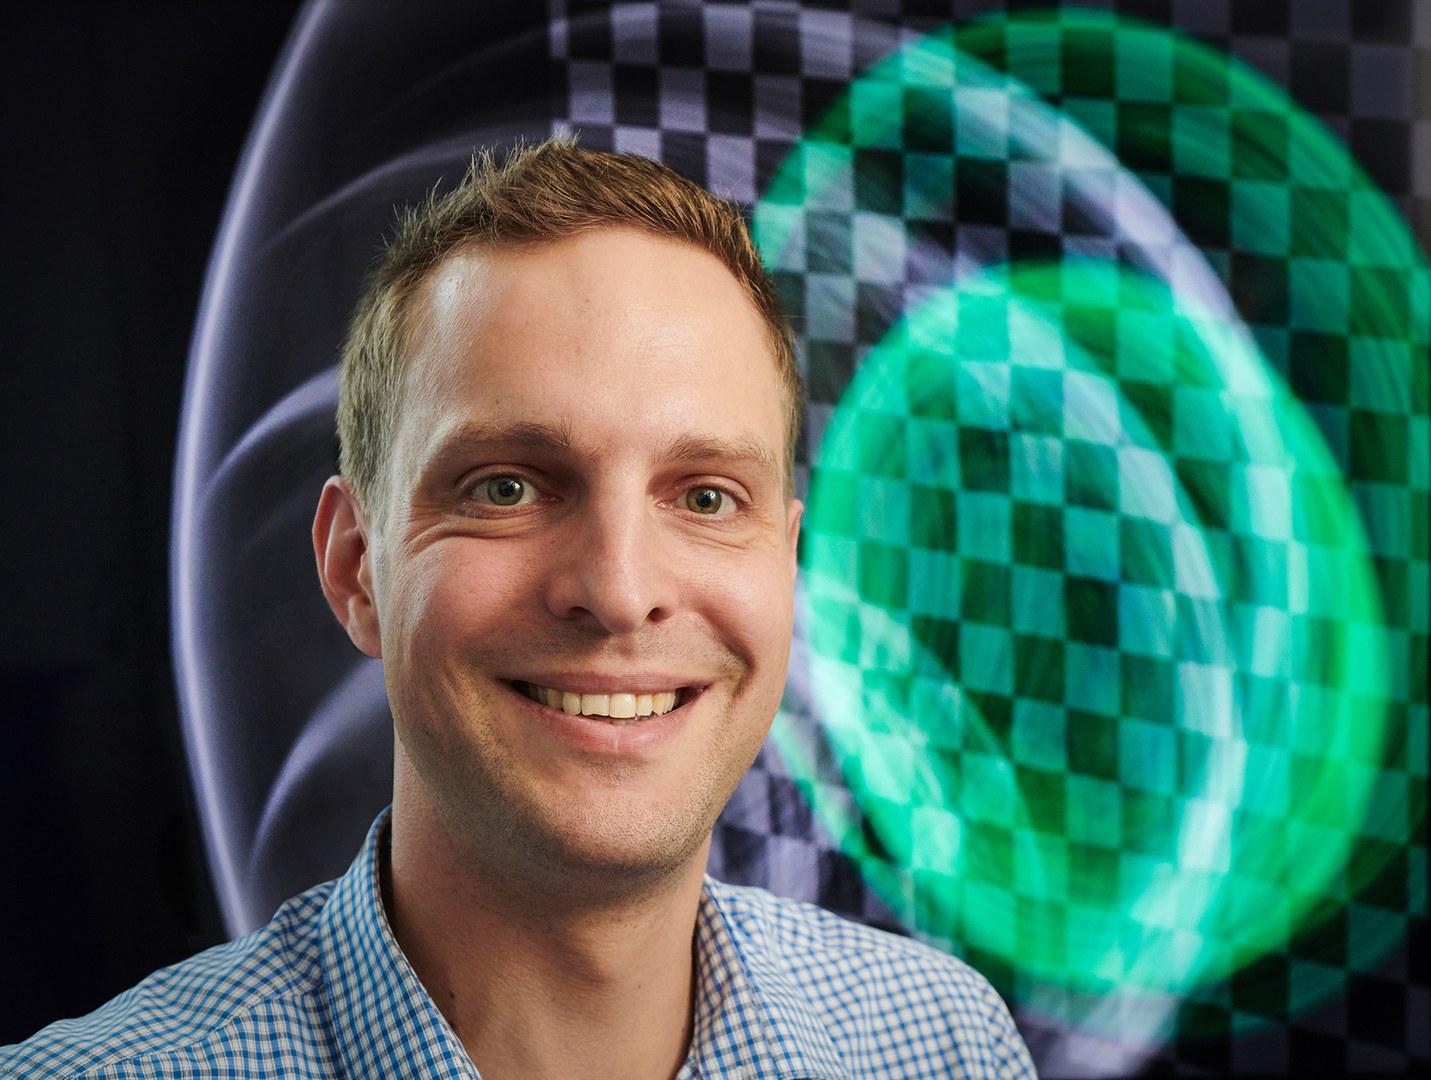 Professor Matthias Hullin from the University of Bonn.